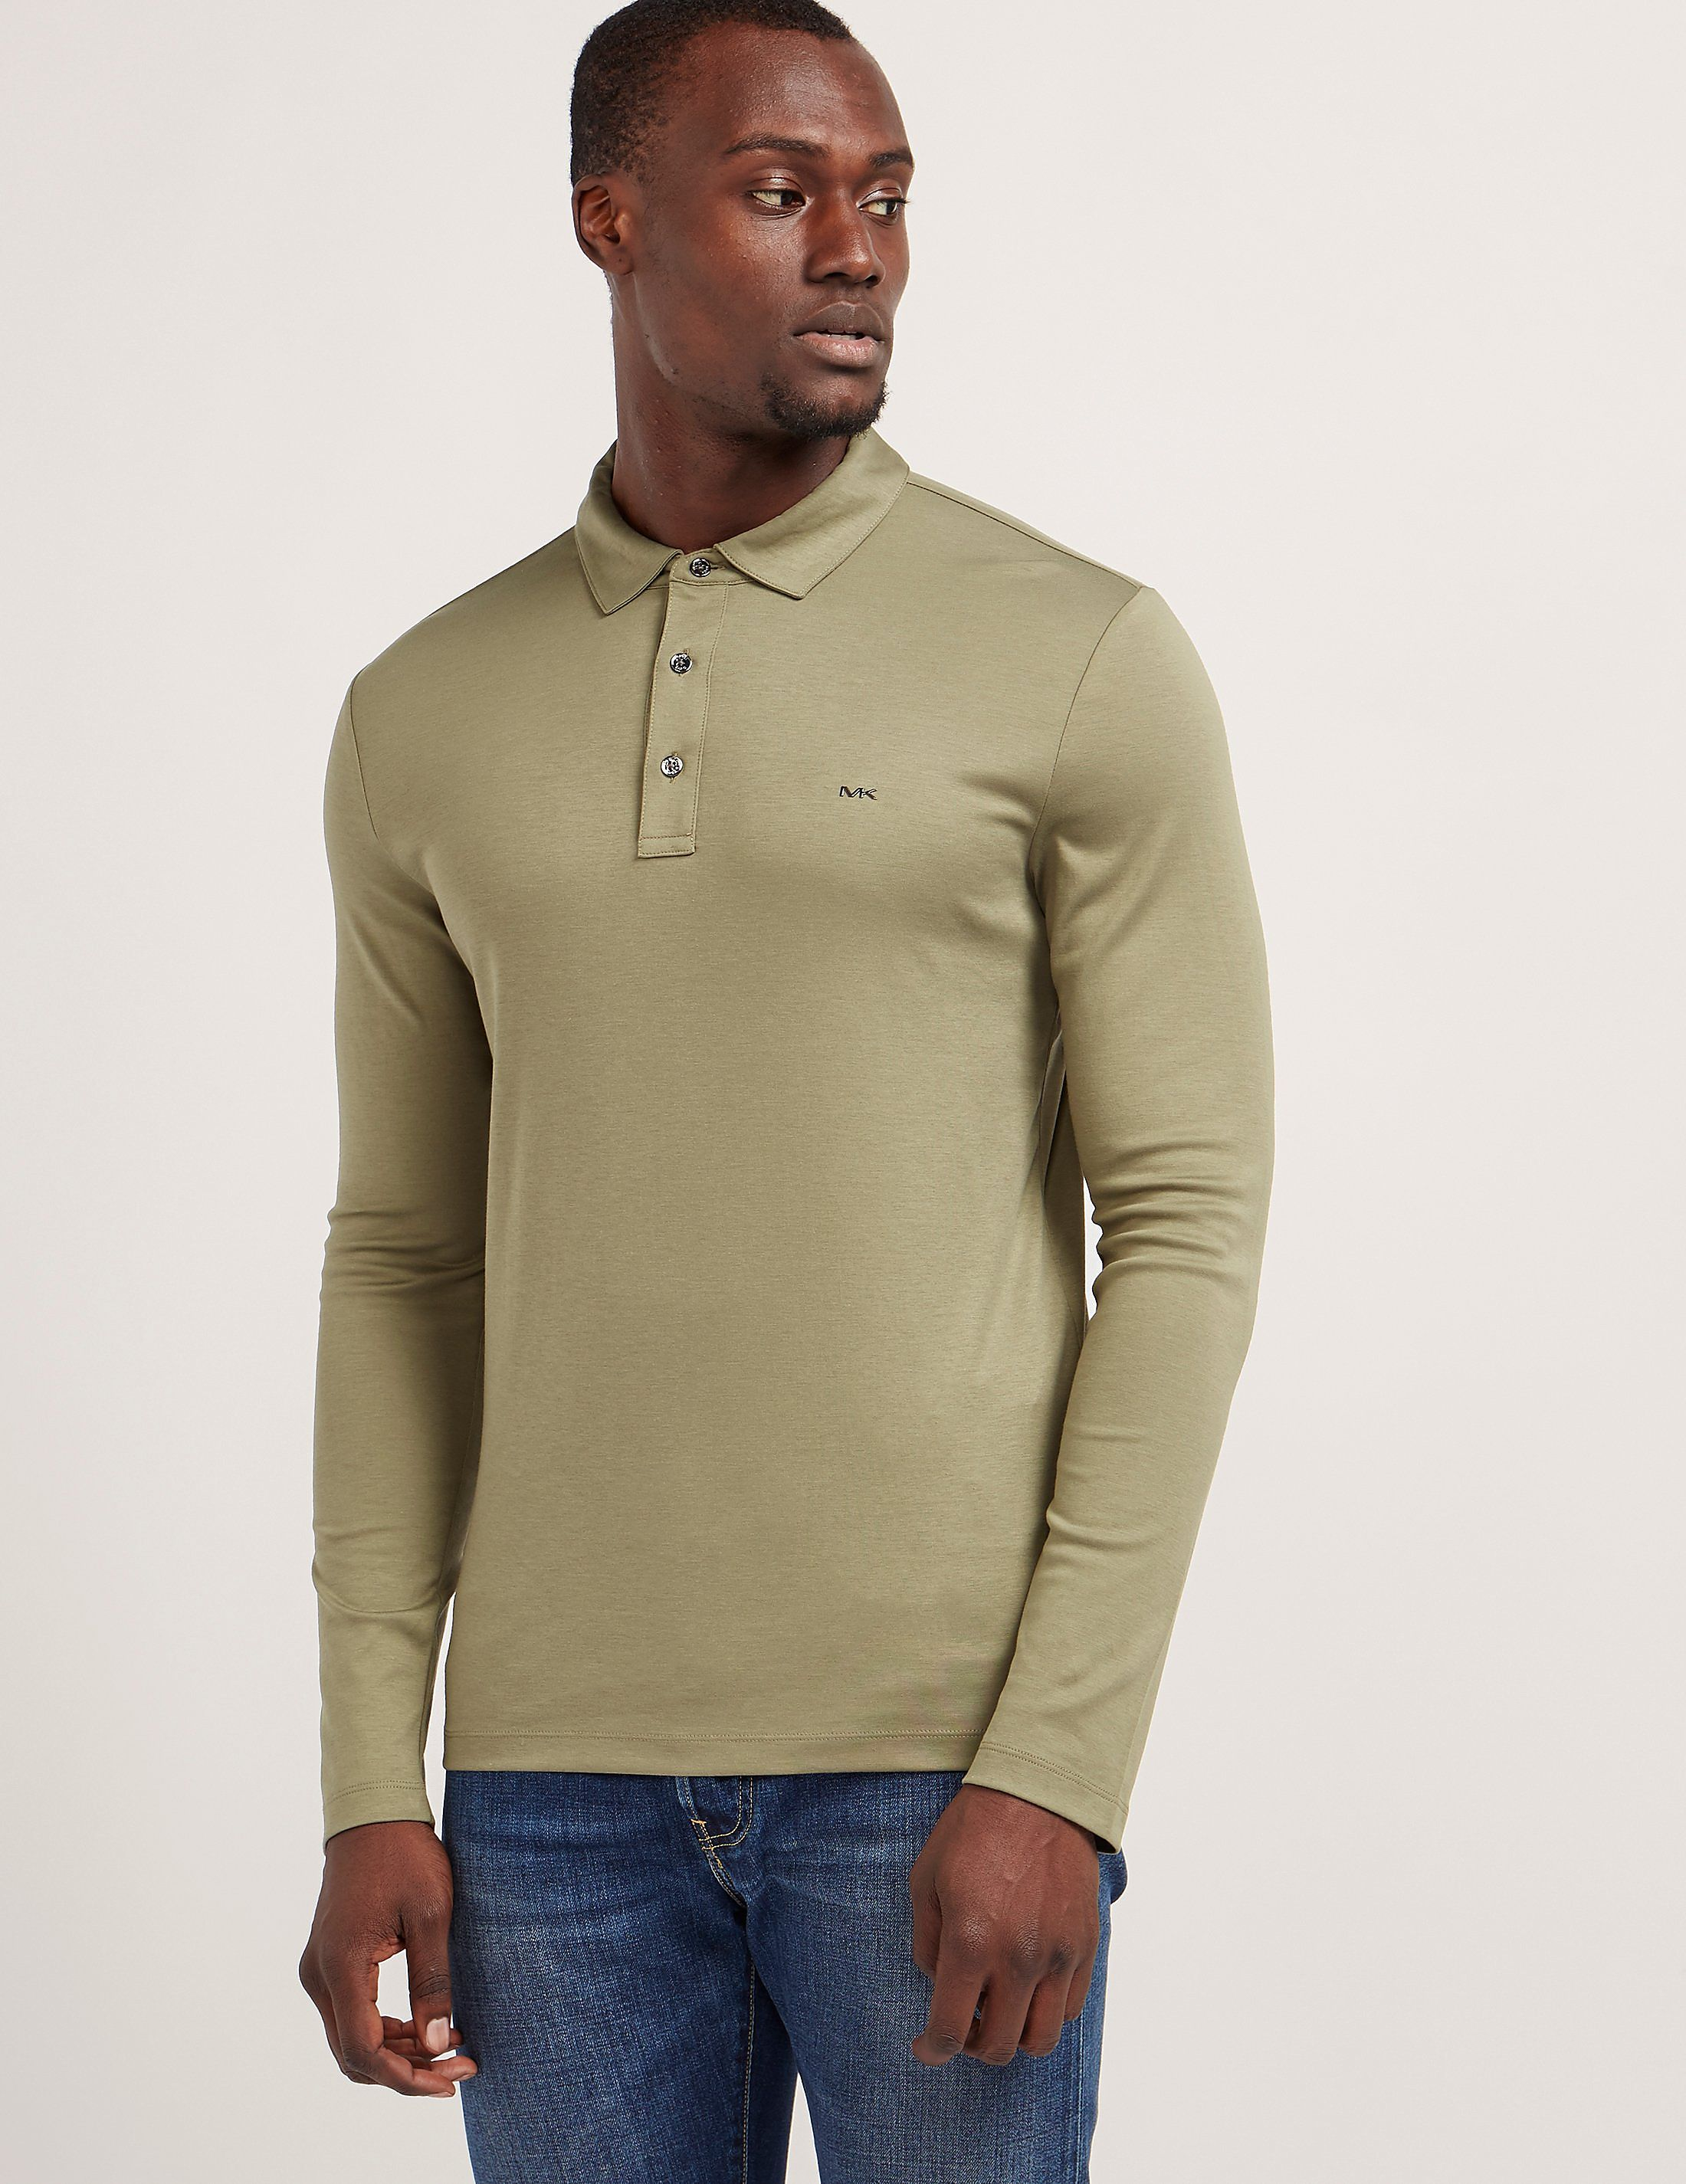 958605b1 Armani Jeans Modern Fit Long Sleeve Polo Shirt | RLDM